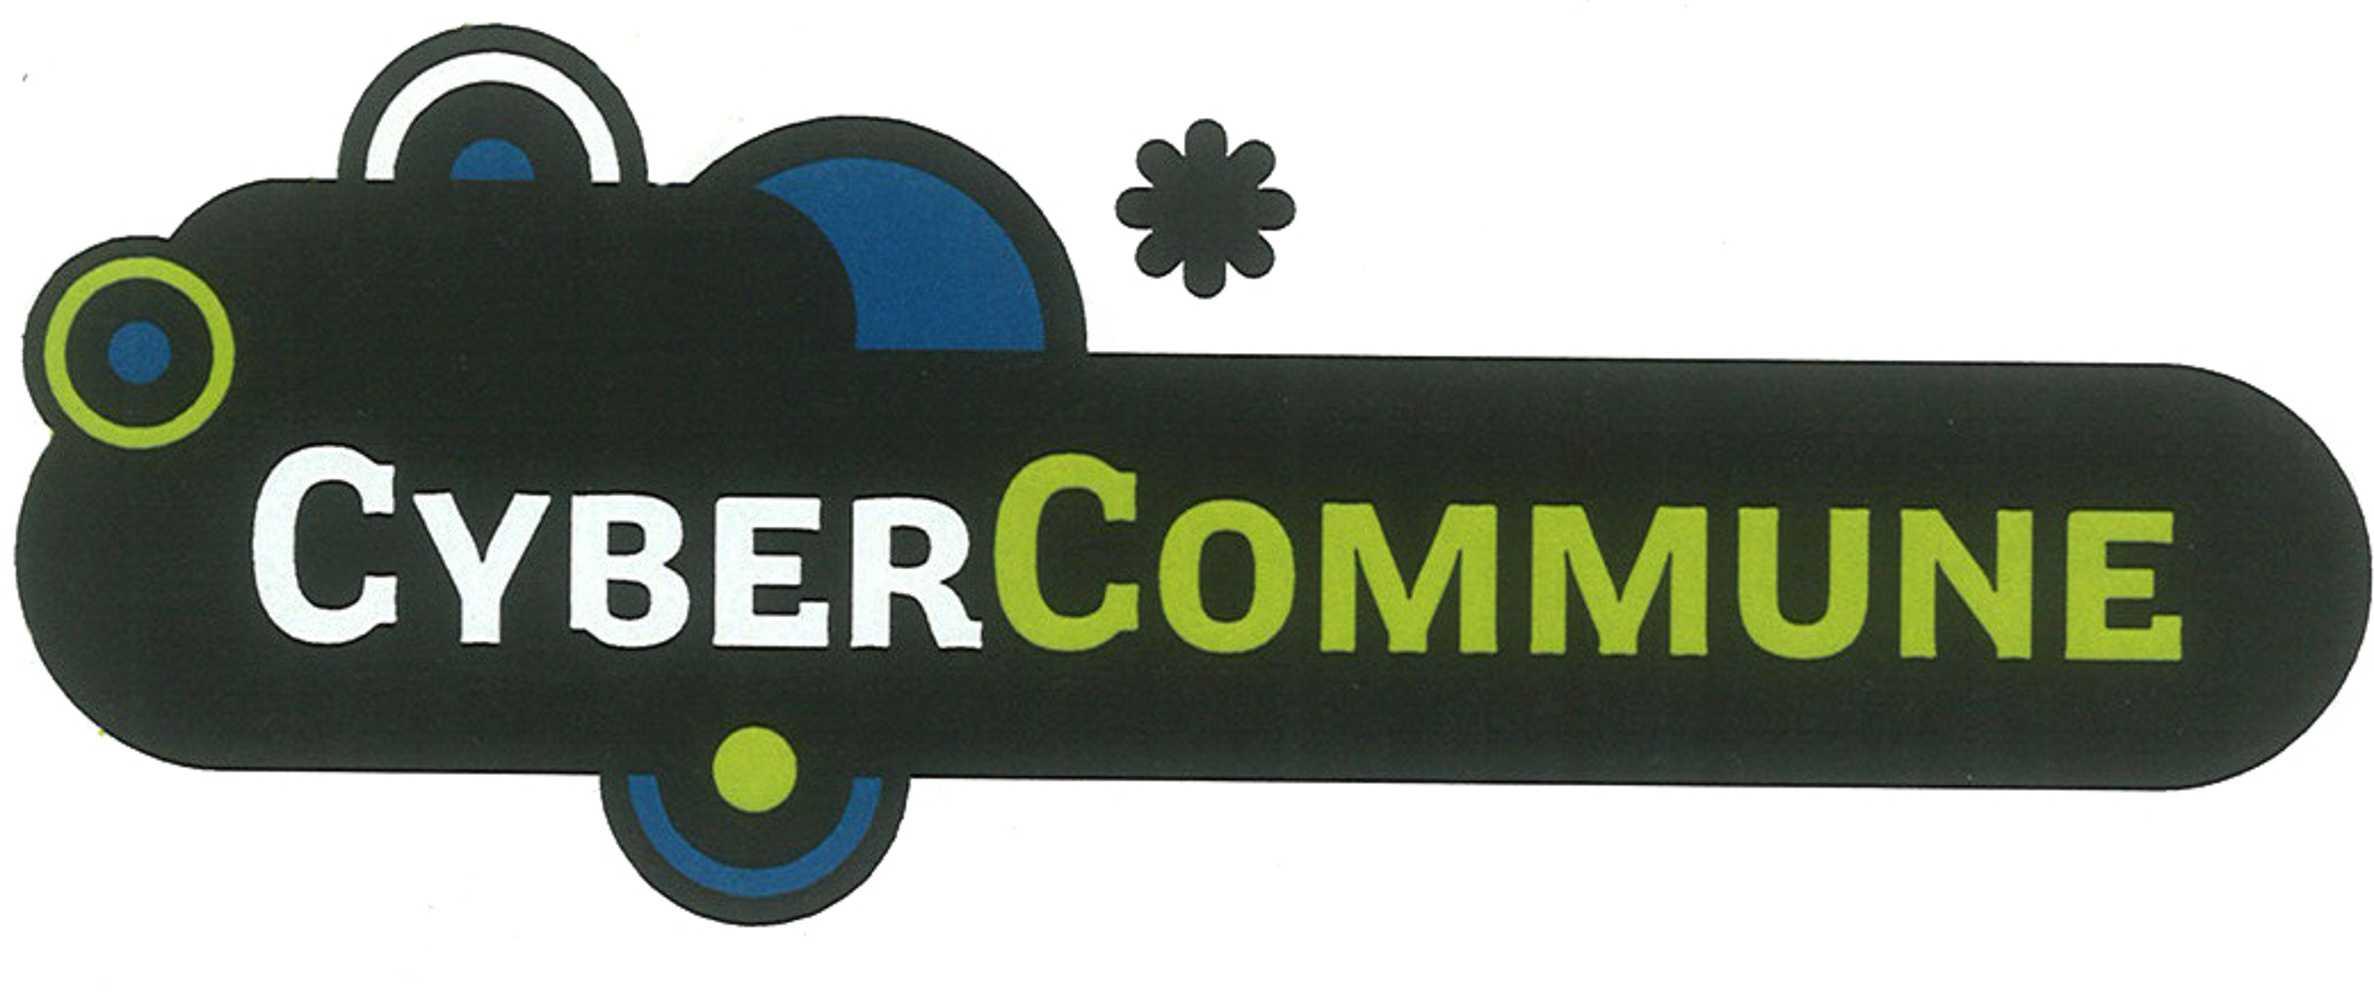 Cybercommune 0